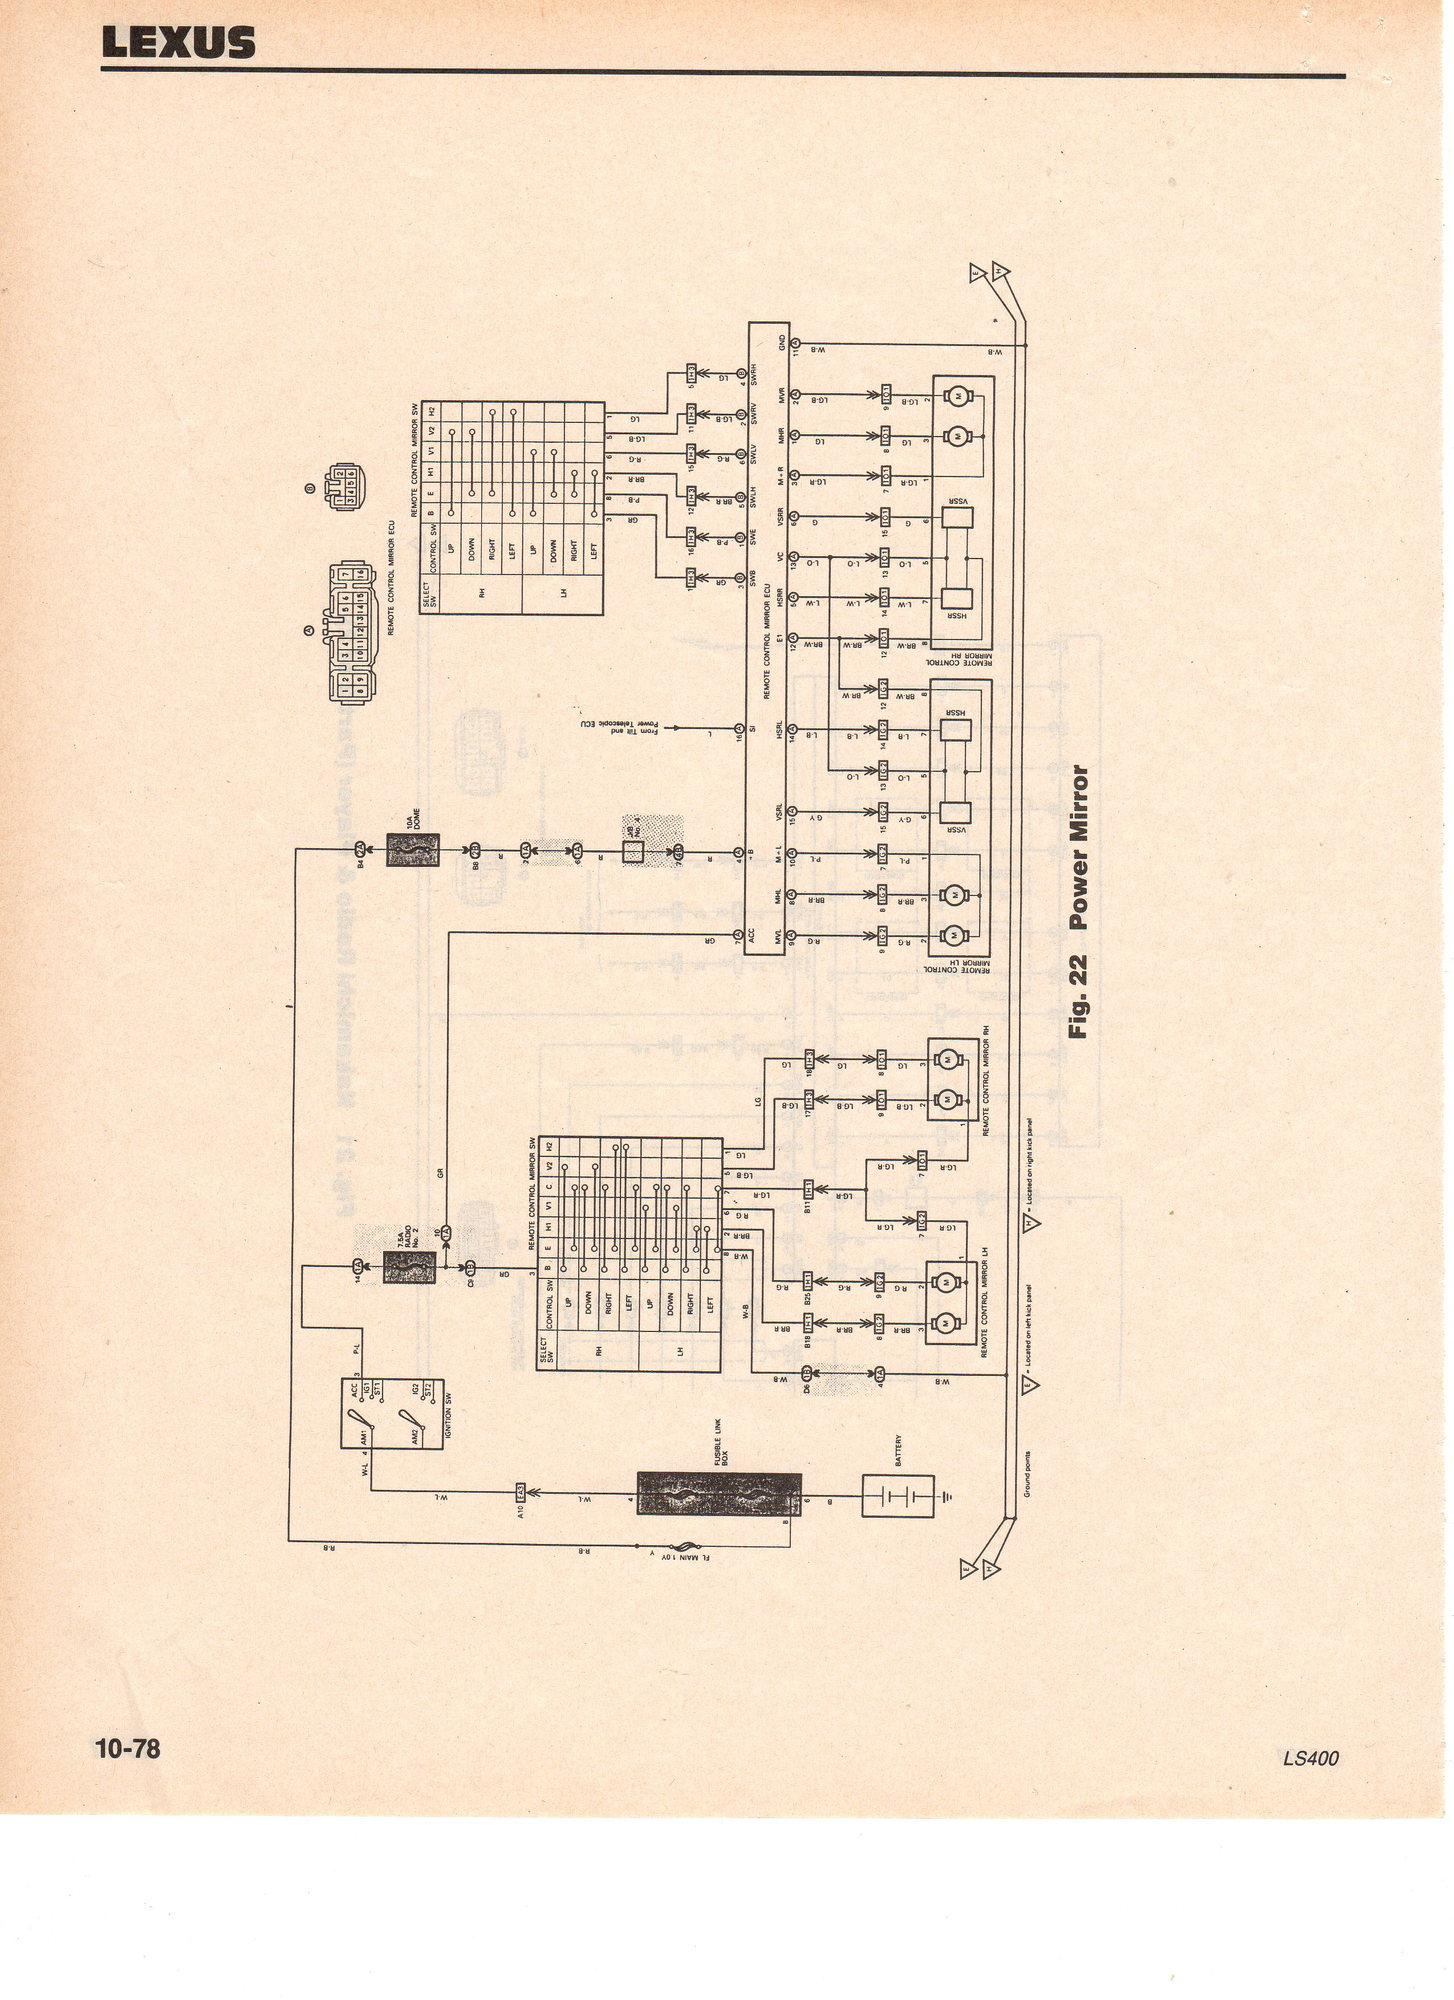 Diagram Fuse Diagram On 1994 Lexus Full Version Hd Quality 1994 Lexus Diagrameryno Kazantip Fr